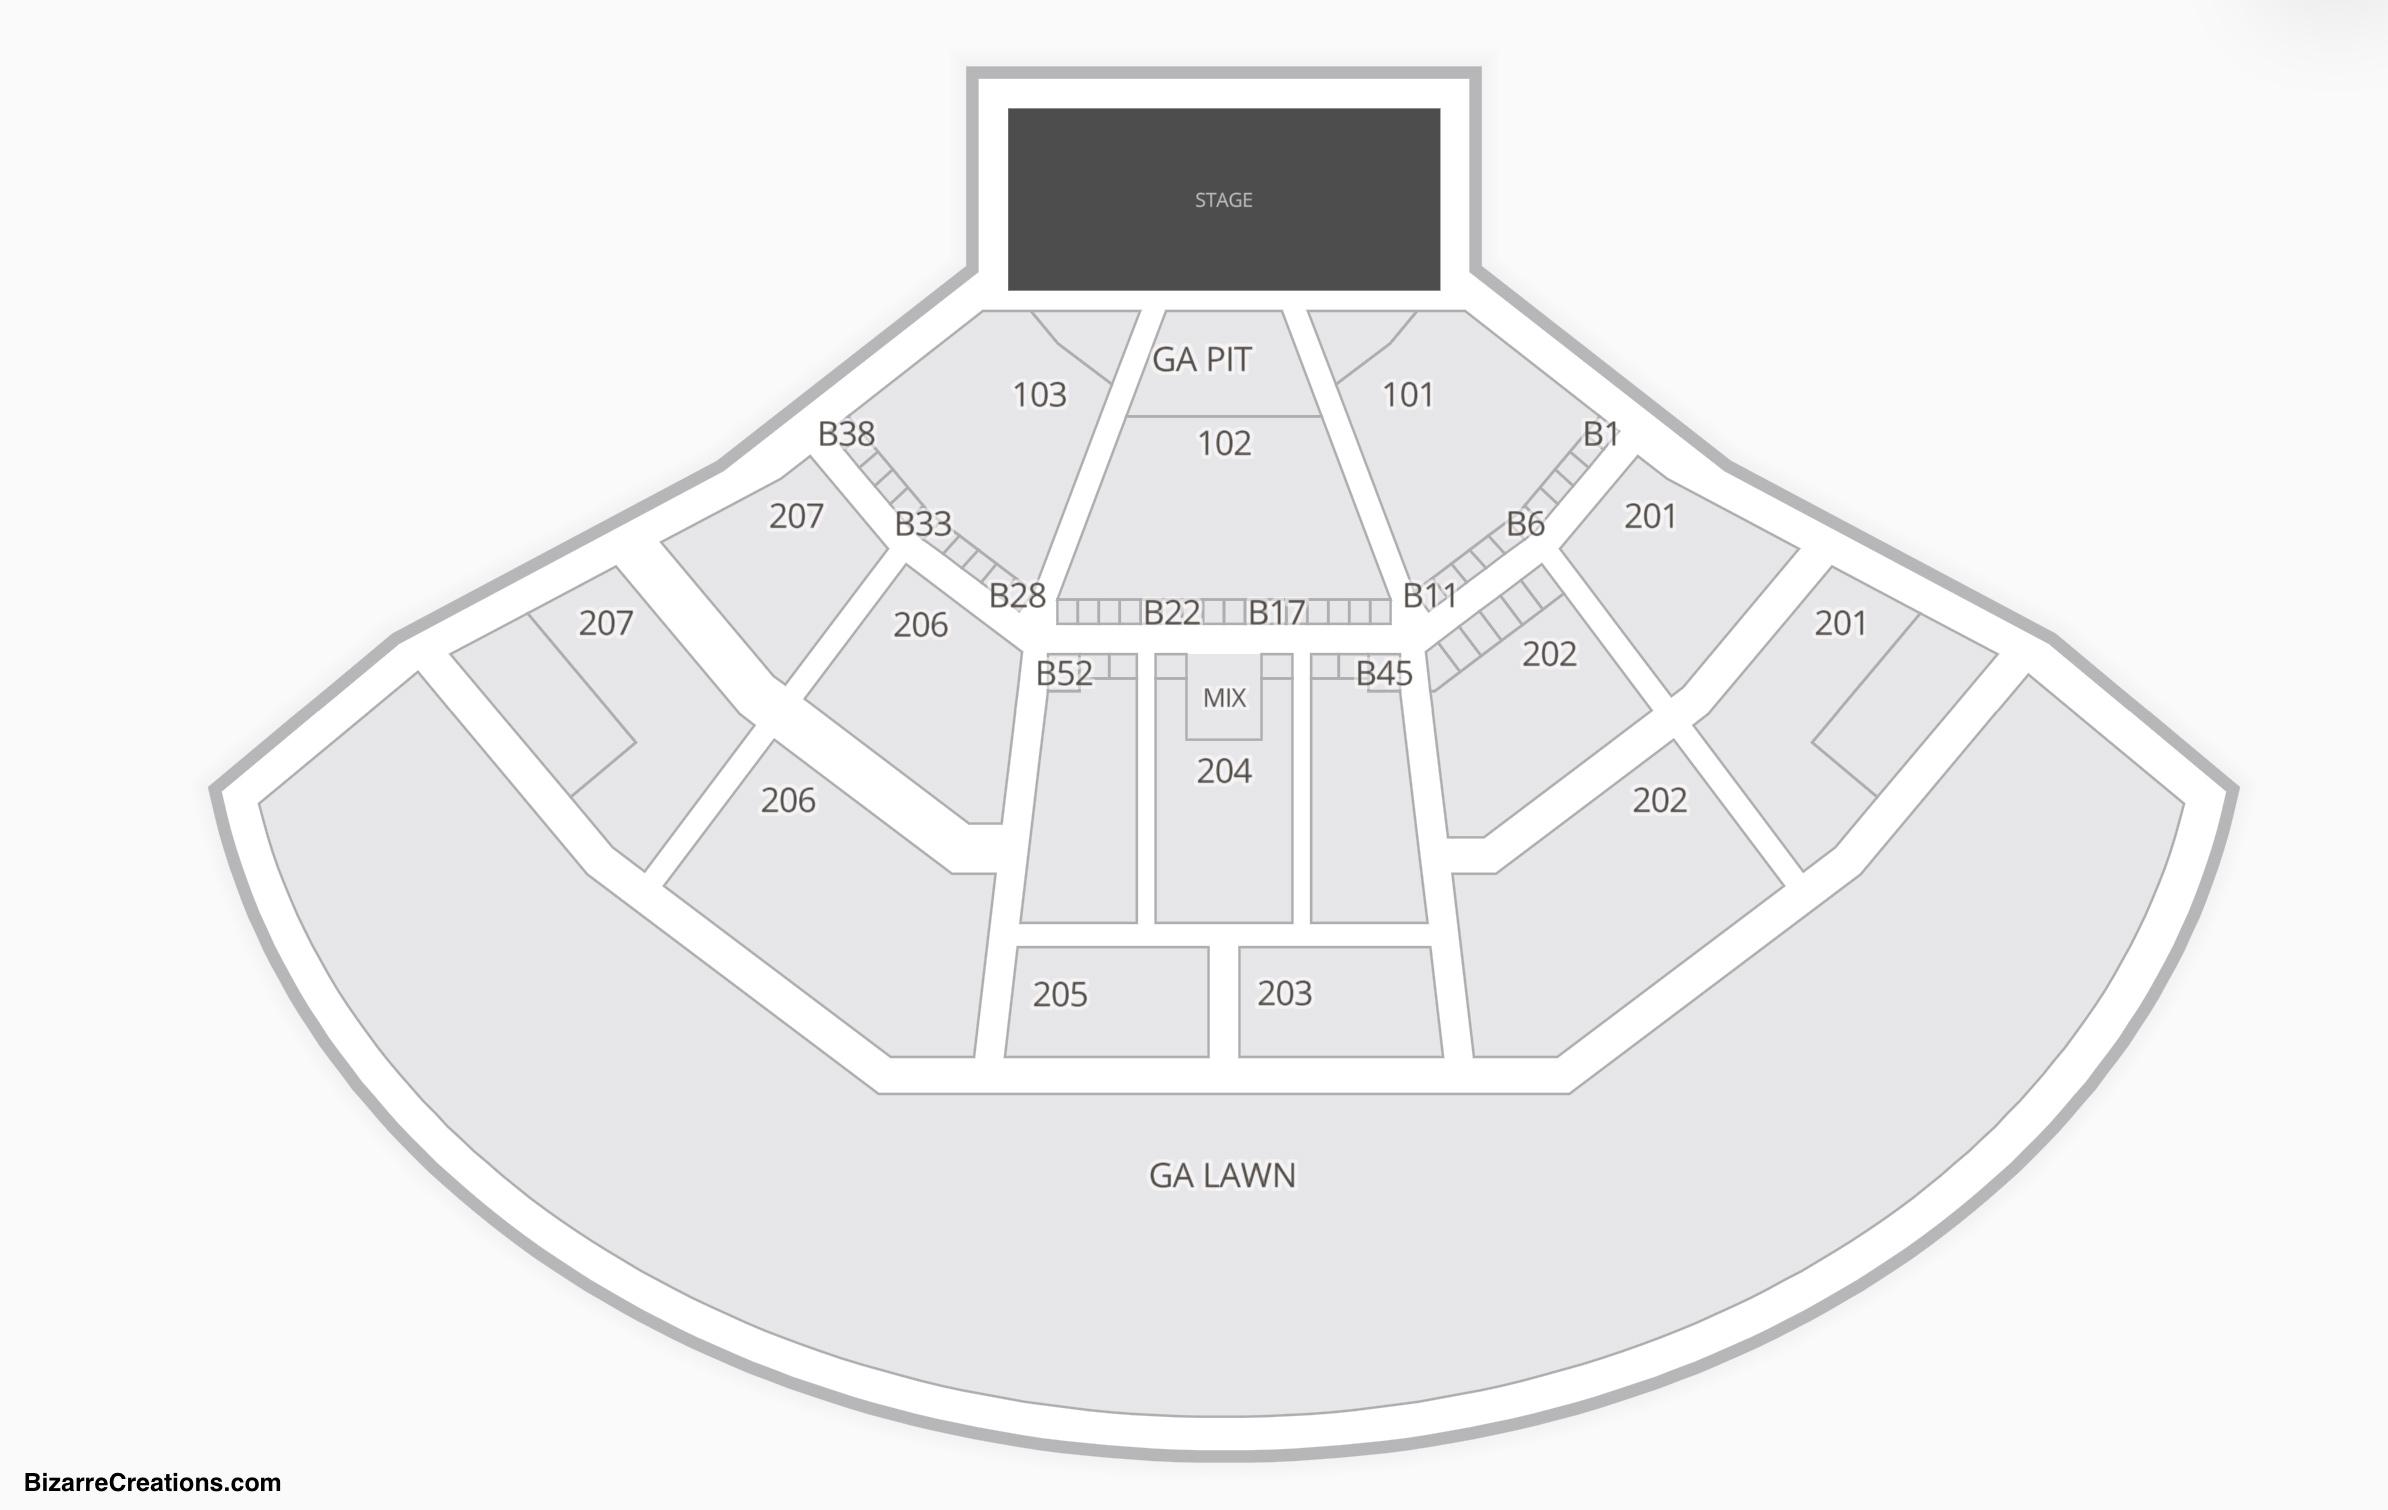 Walnut Creek Amphitheatre Interactive Seating Chart Arenda